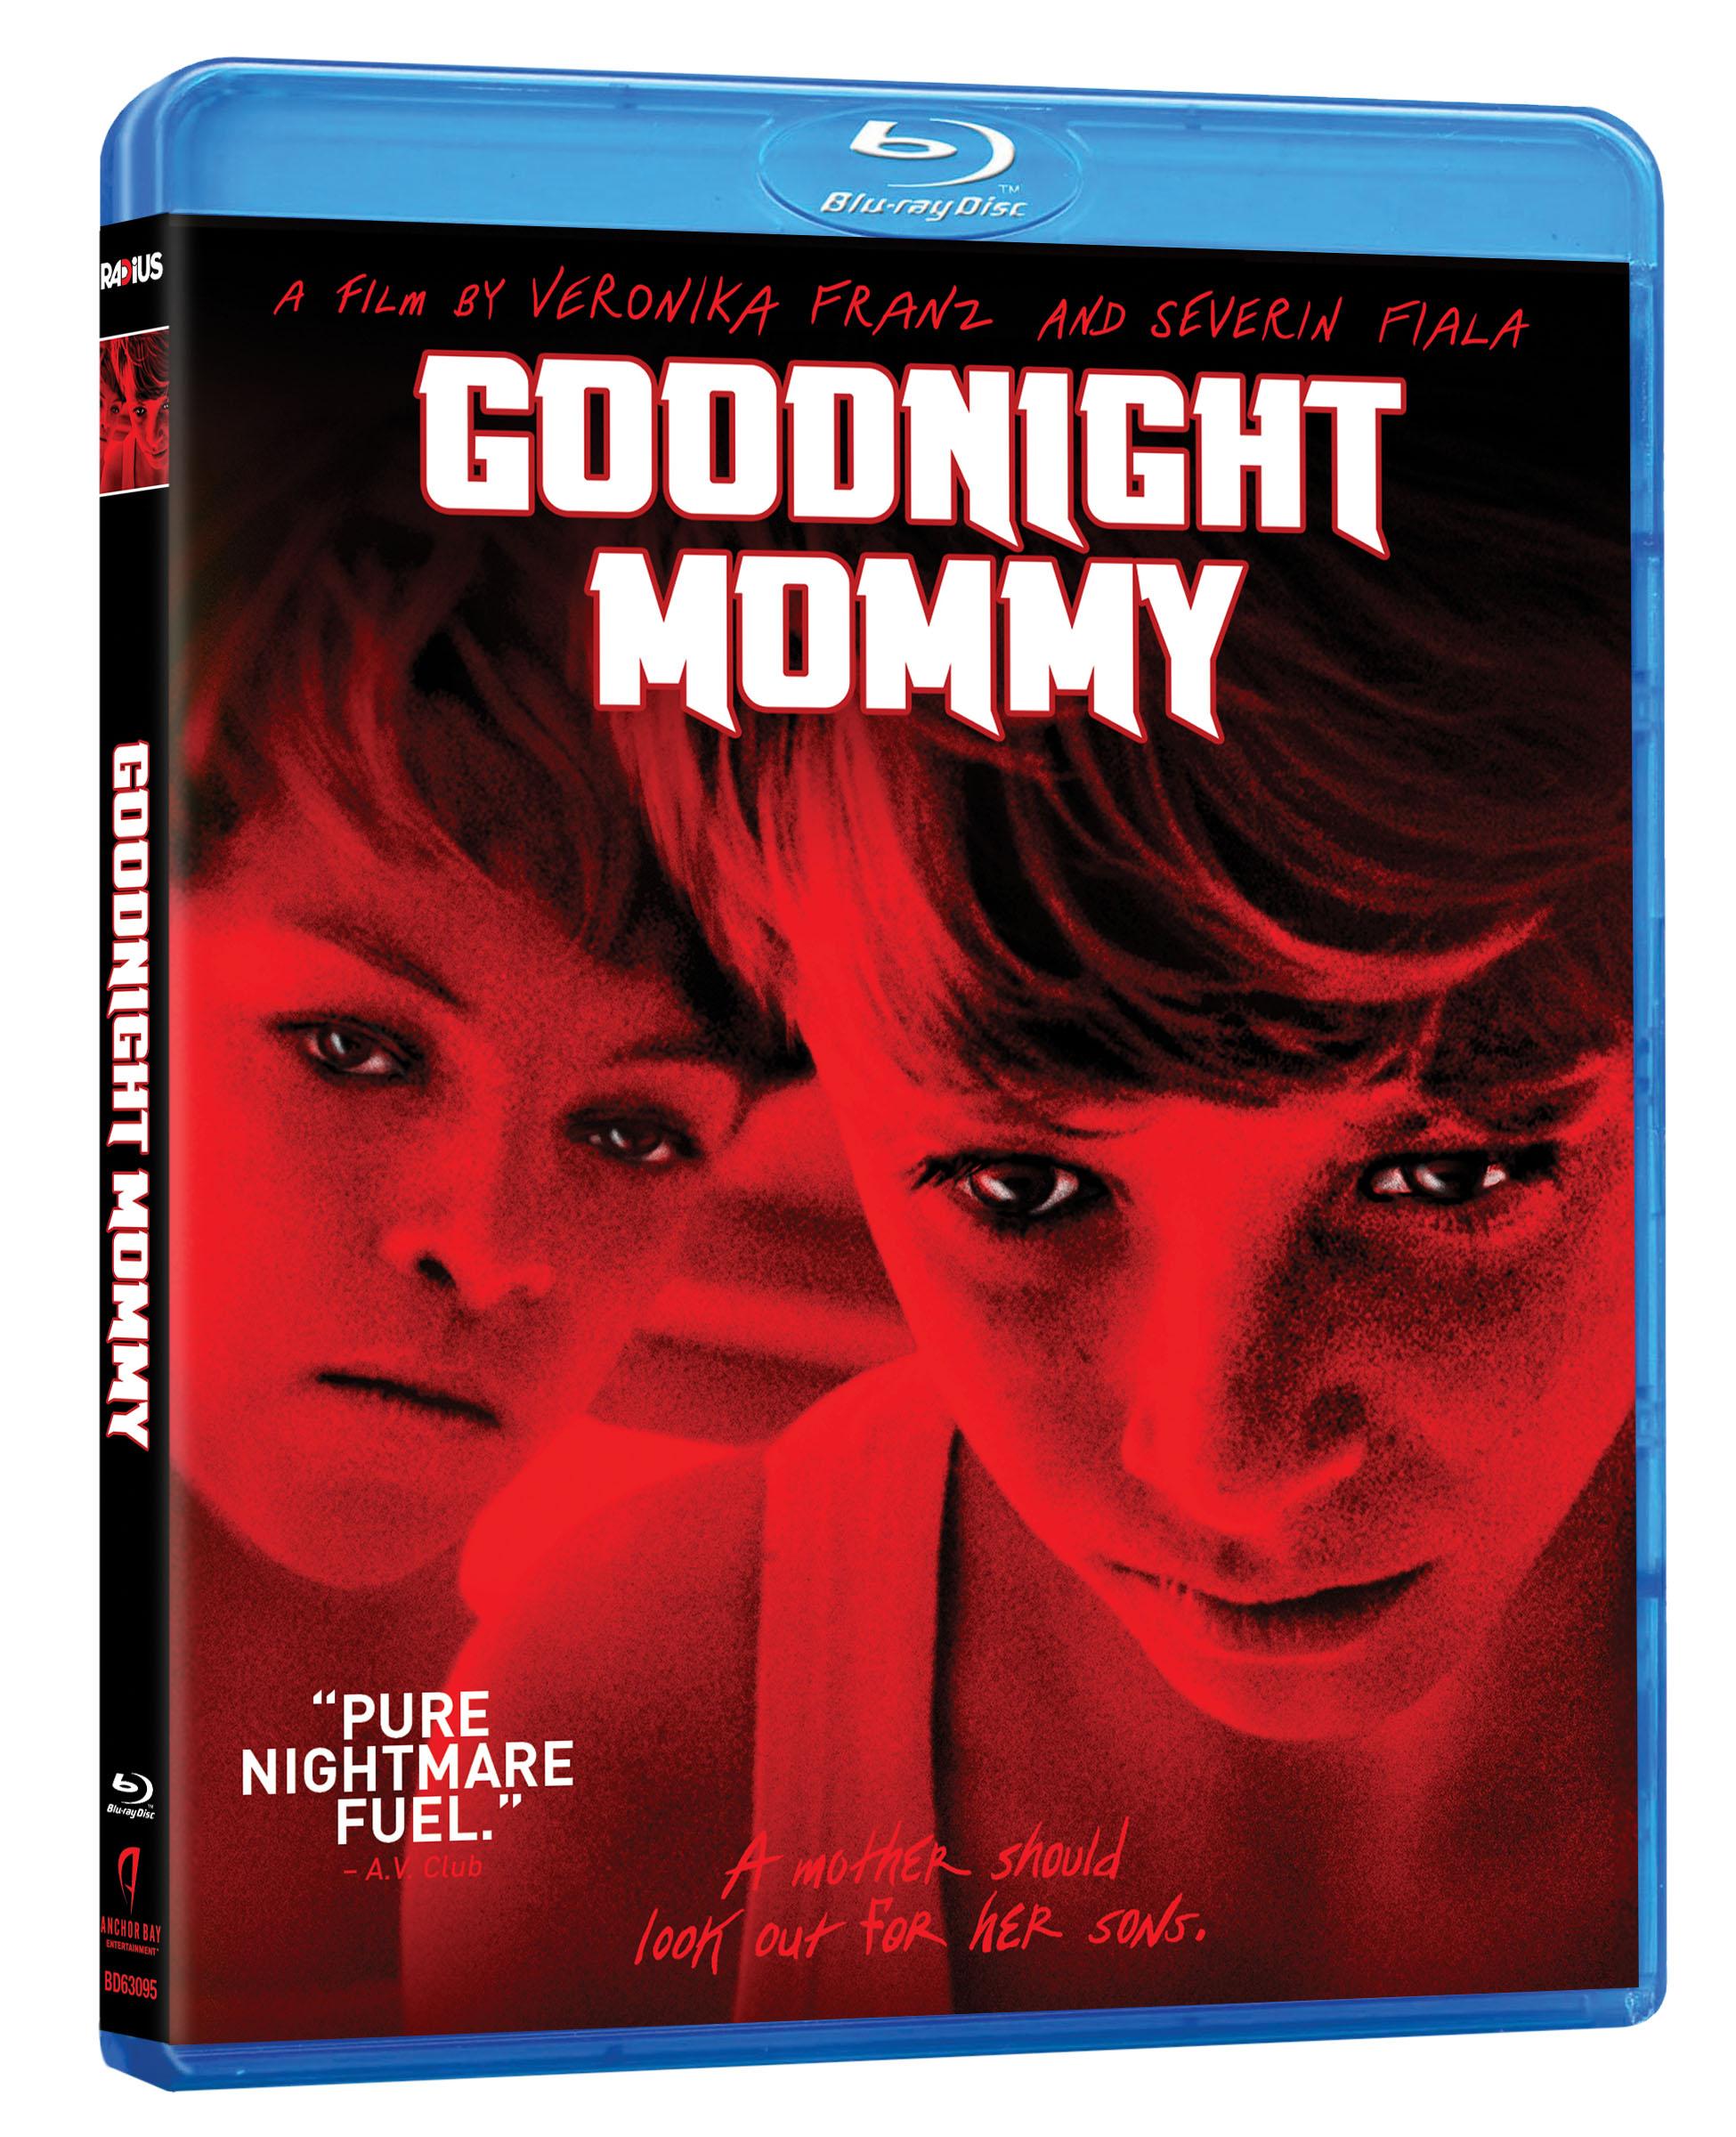 GOODNIGHT MOMMY Blu-ray